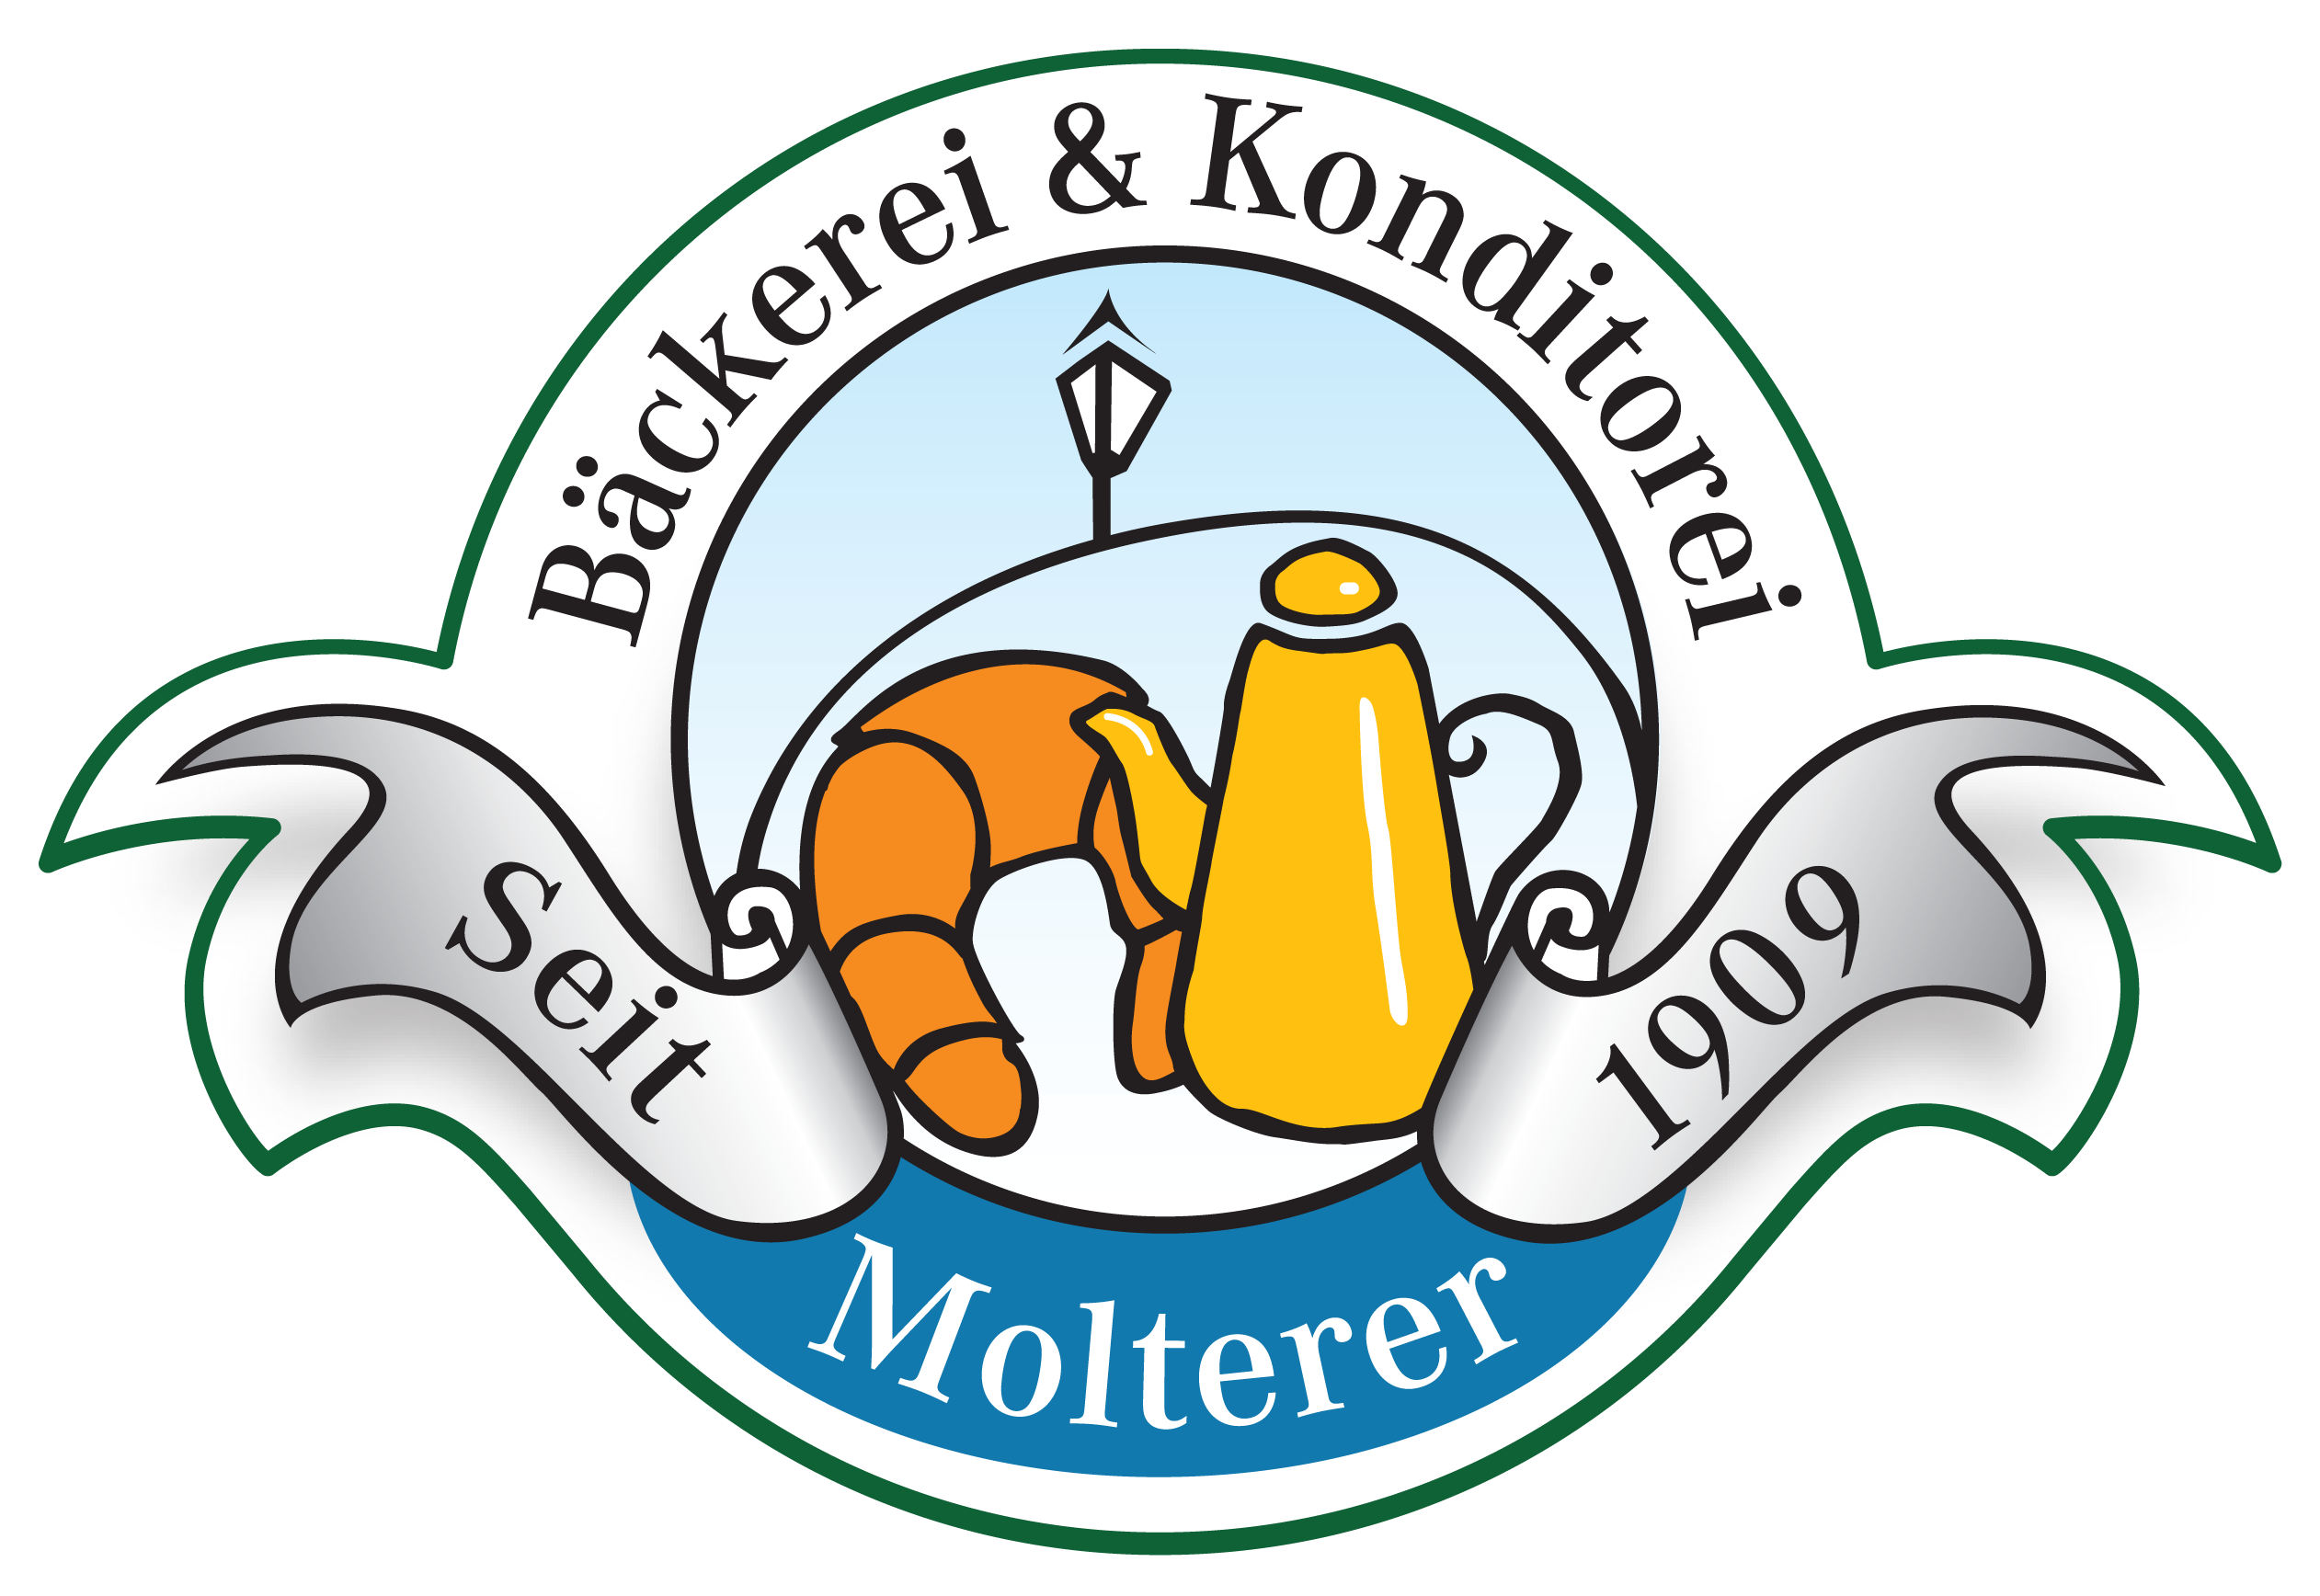 Bäckerei Molterer